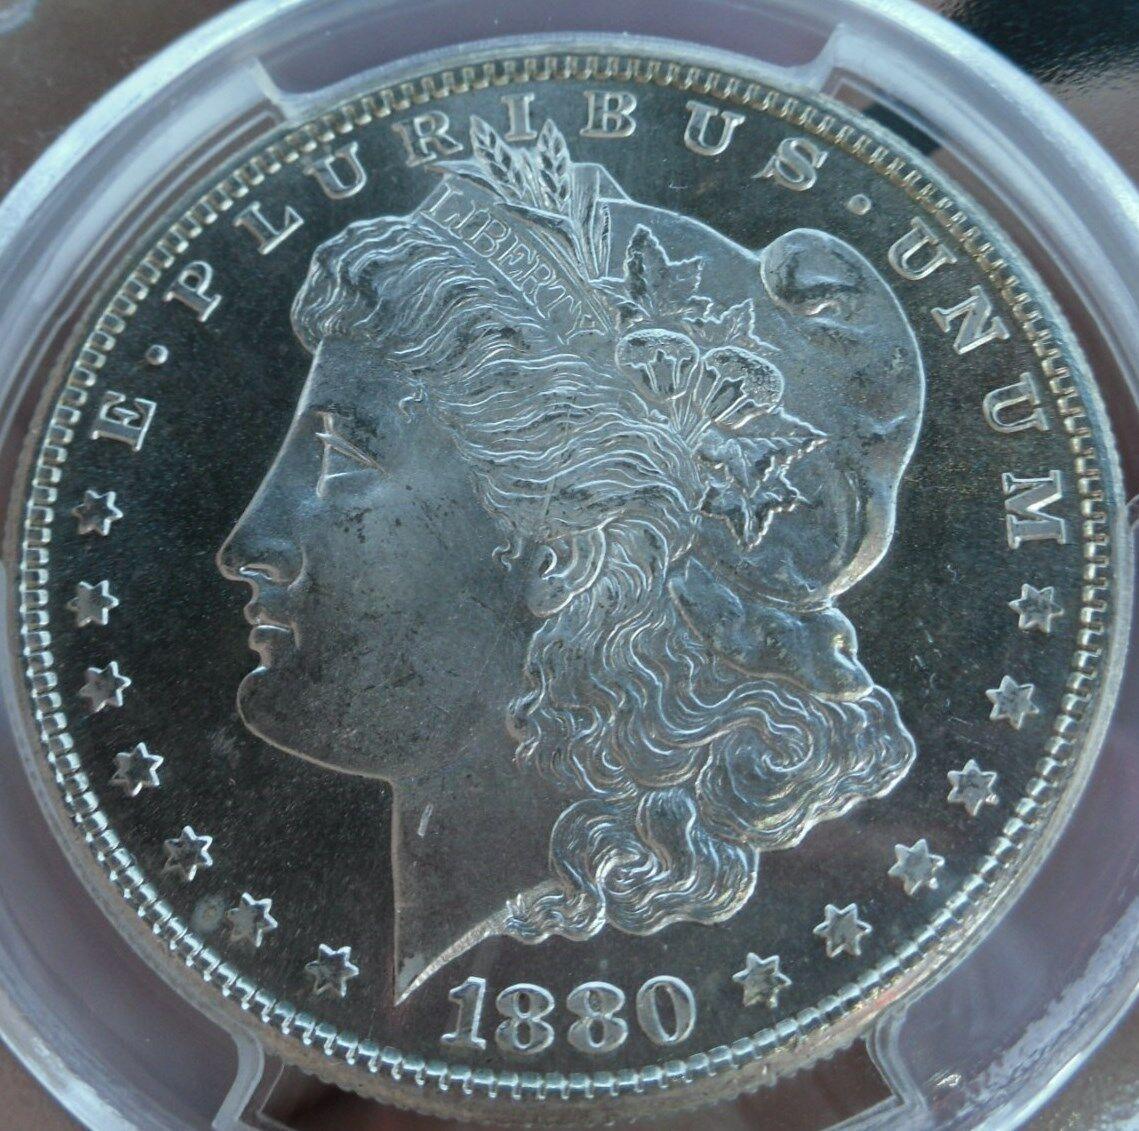 JMC Rare Coins